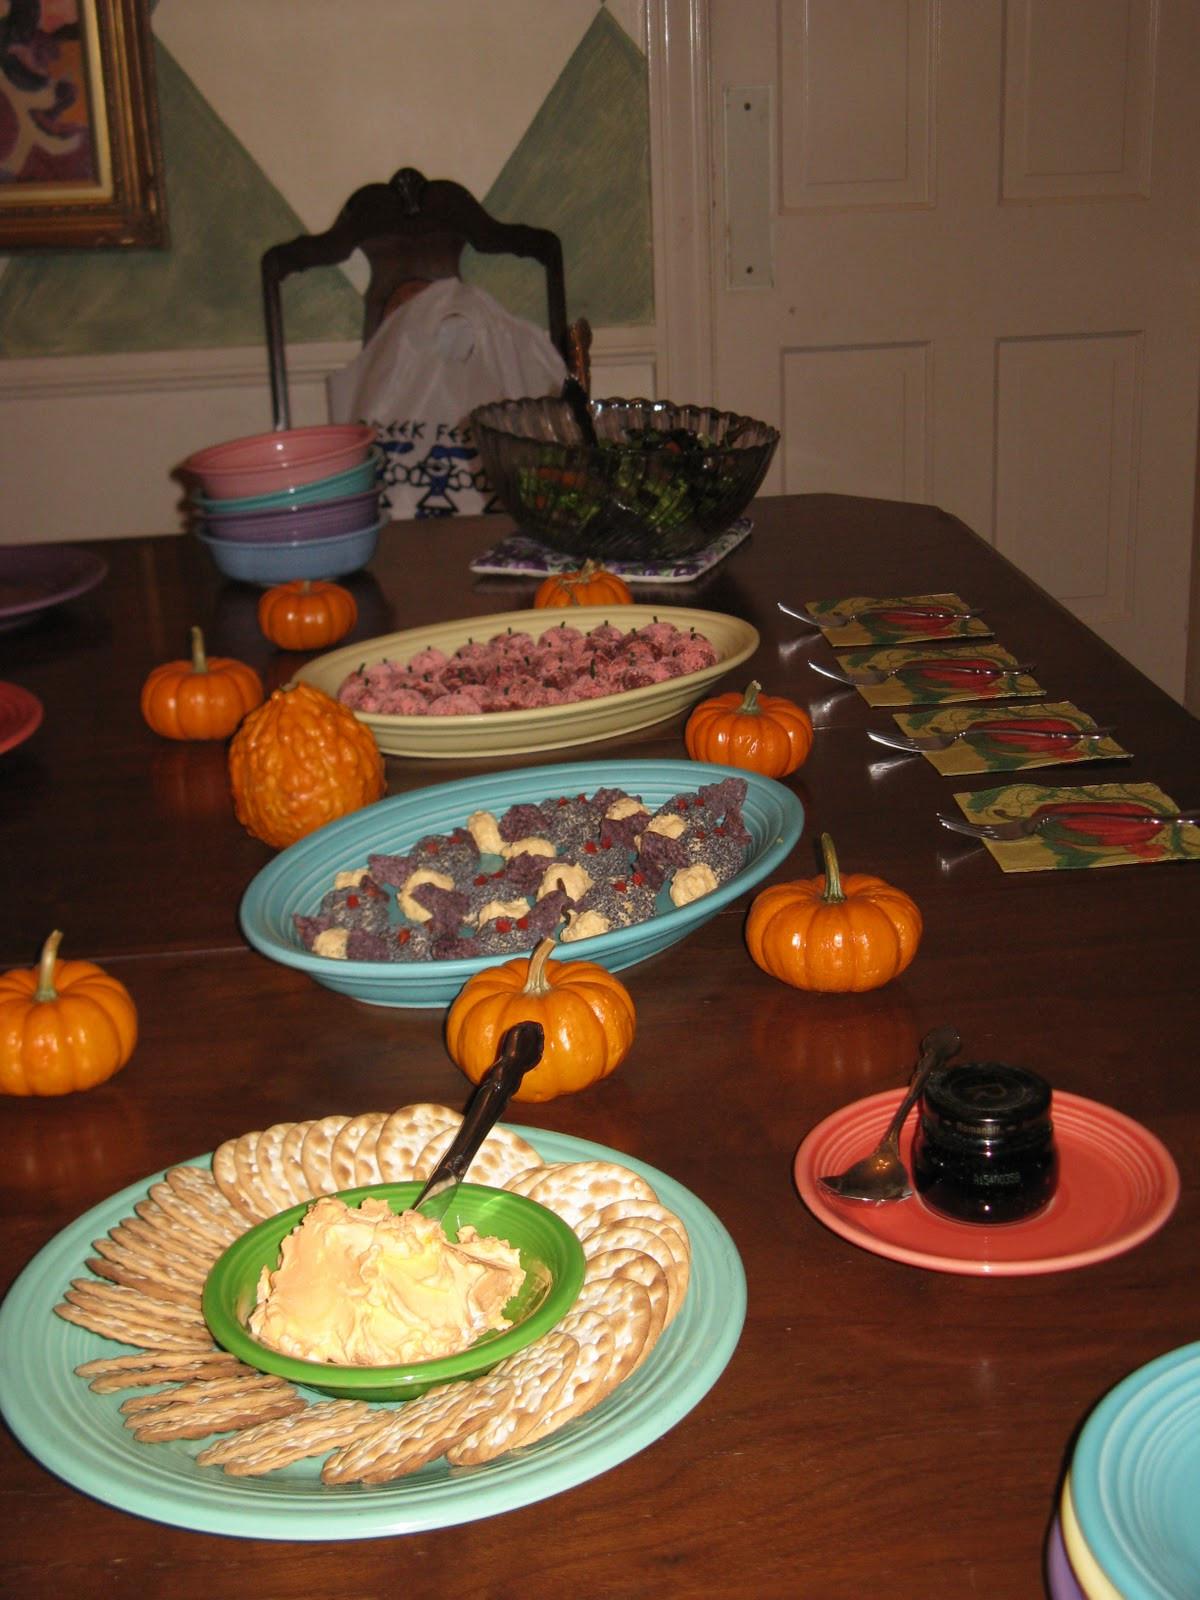 Halloween Themed Dinner  The Expressive Figures Janet Bodin October 2010